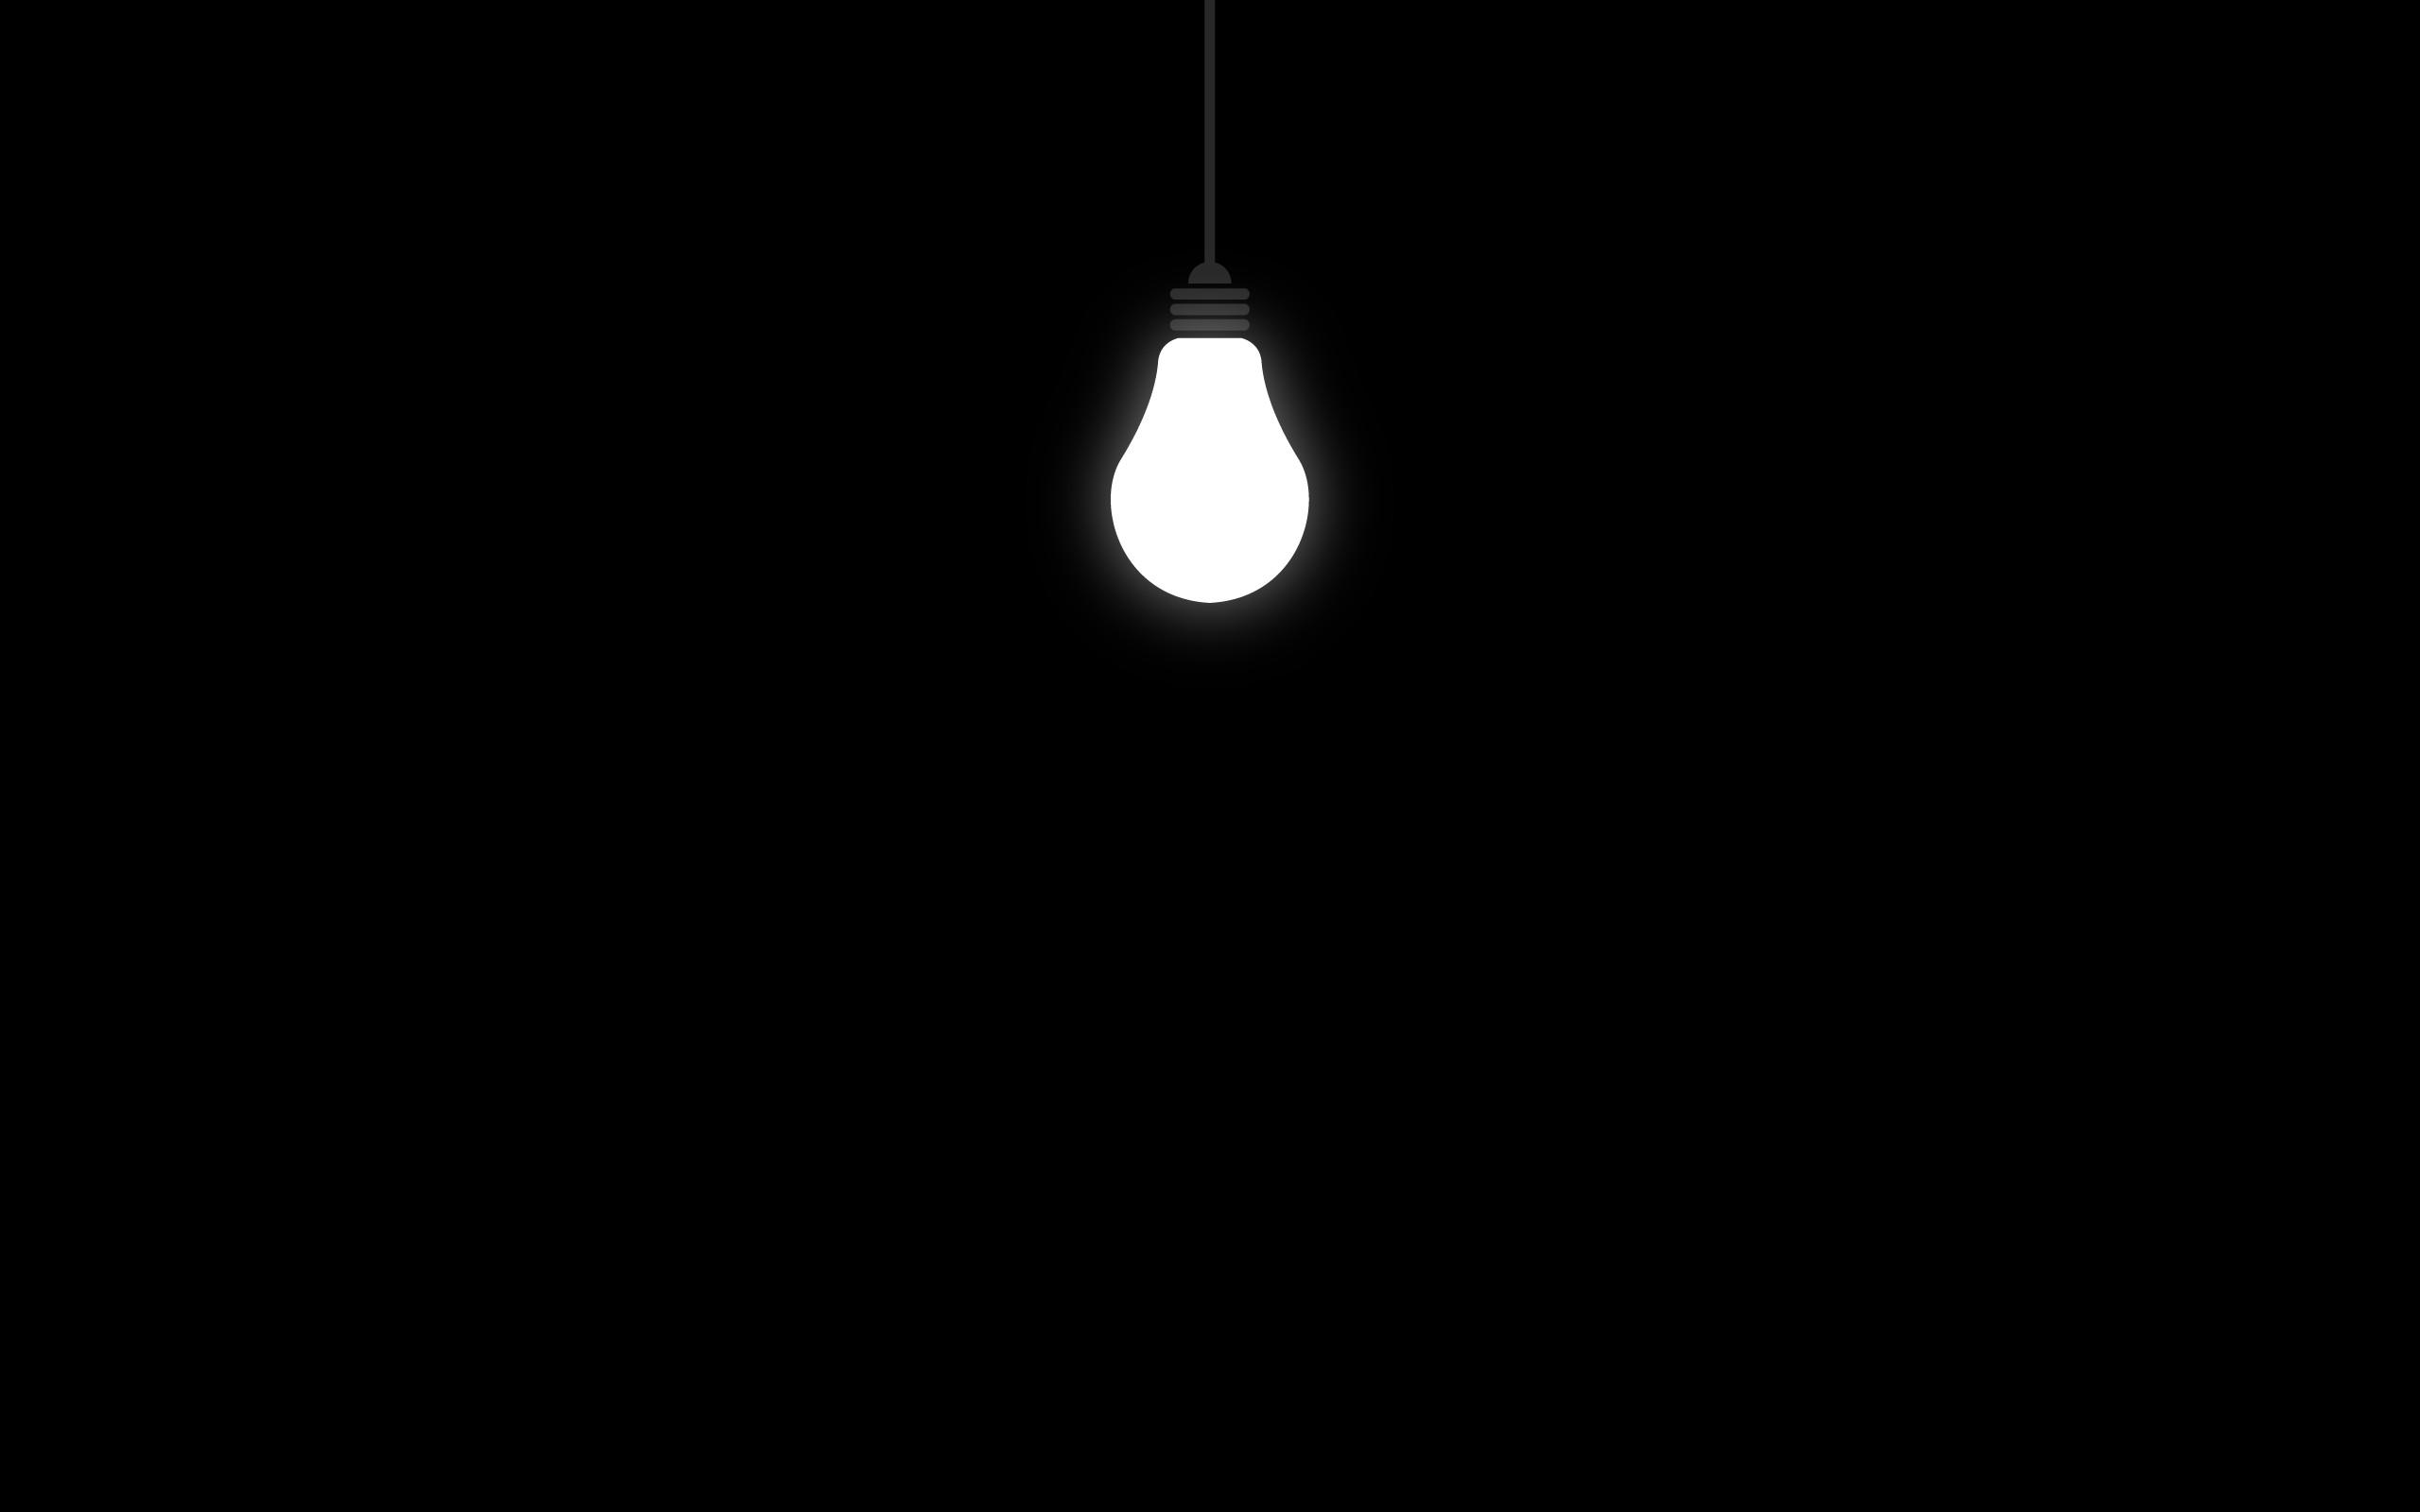 Dark Aesthetic Boltalka Oboi 43227562 Fanpop